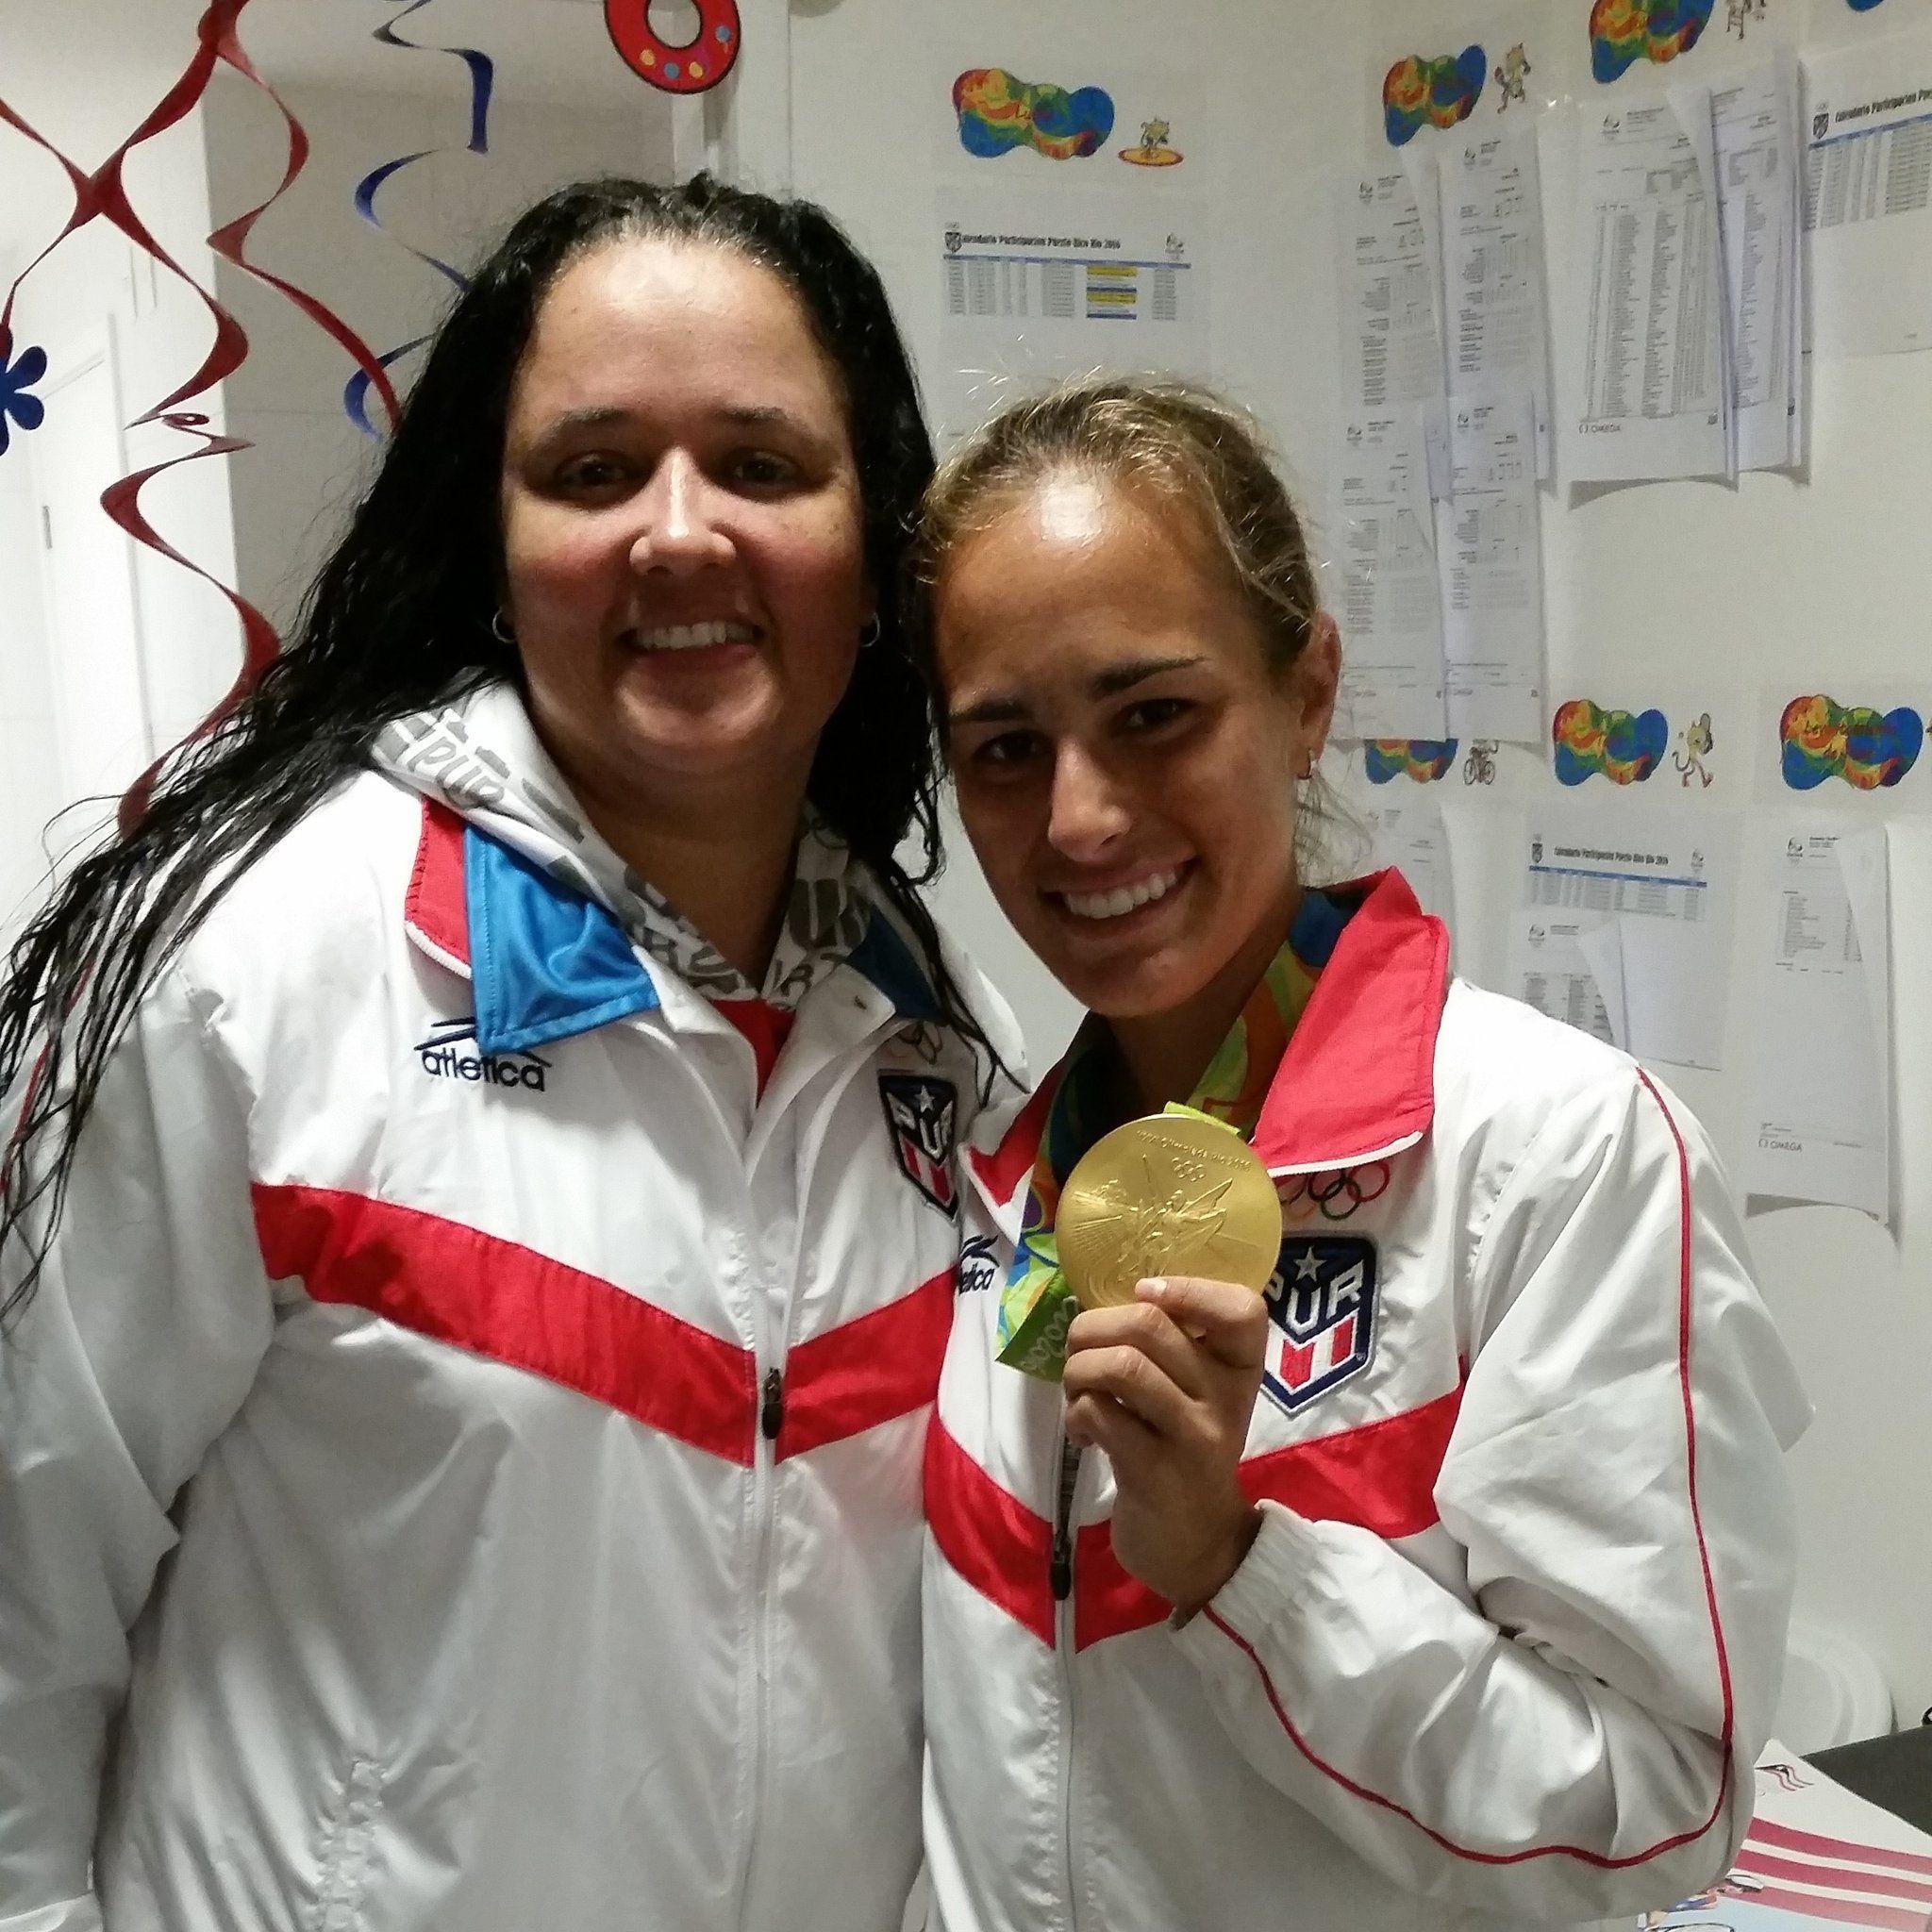 "Xiomara Molero on Twitter: ""Con la Campeona del  tenis Olimpico #RioOlympics2016. Nuestra @MonicaAce93, #PUIGNETA. Que Orgullo. https://t.co/NHUmWetO0f"""